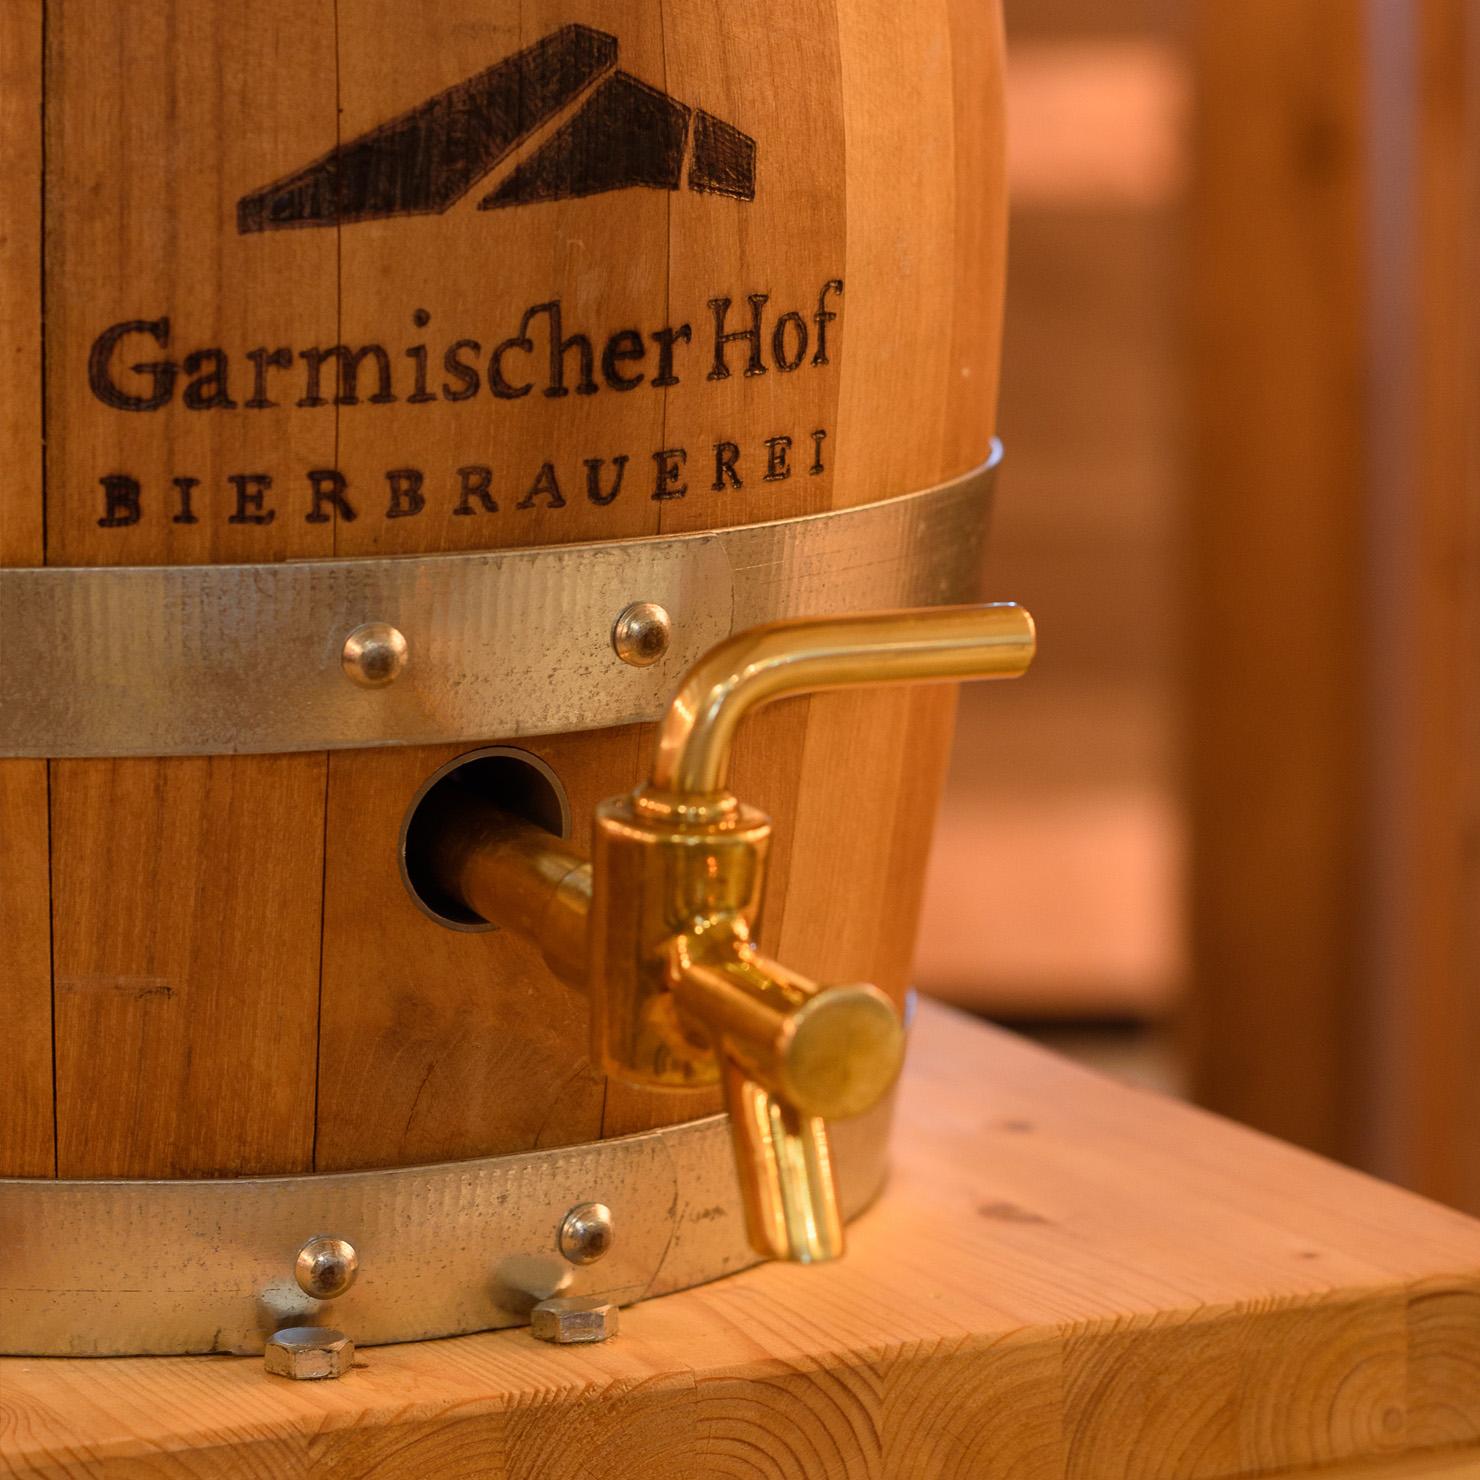 Garmischer Hof Bierbrauerei Getränkekarte Bierfass